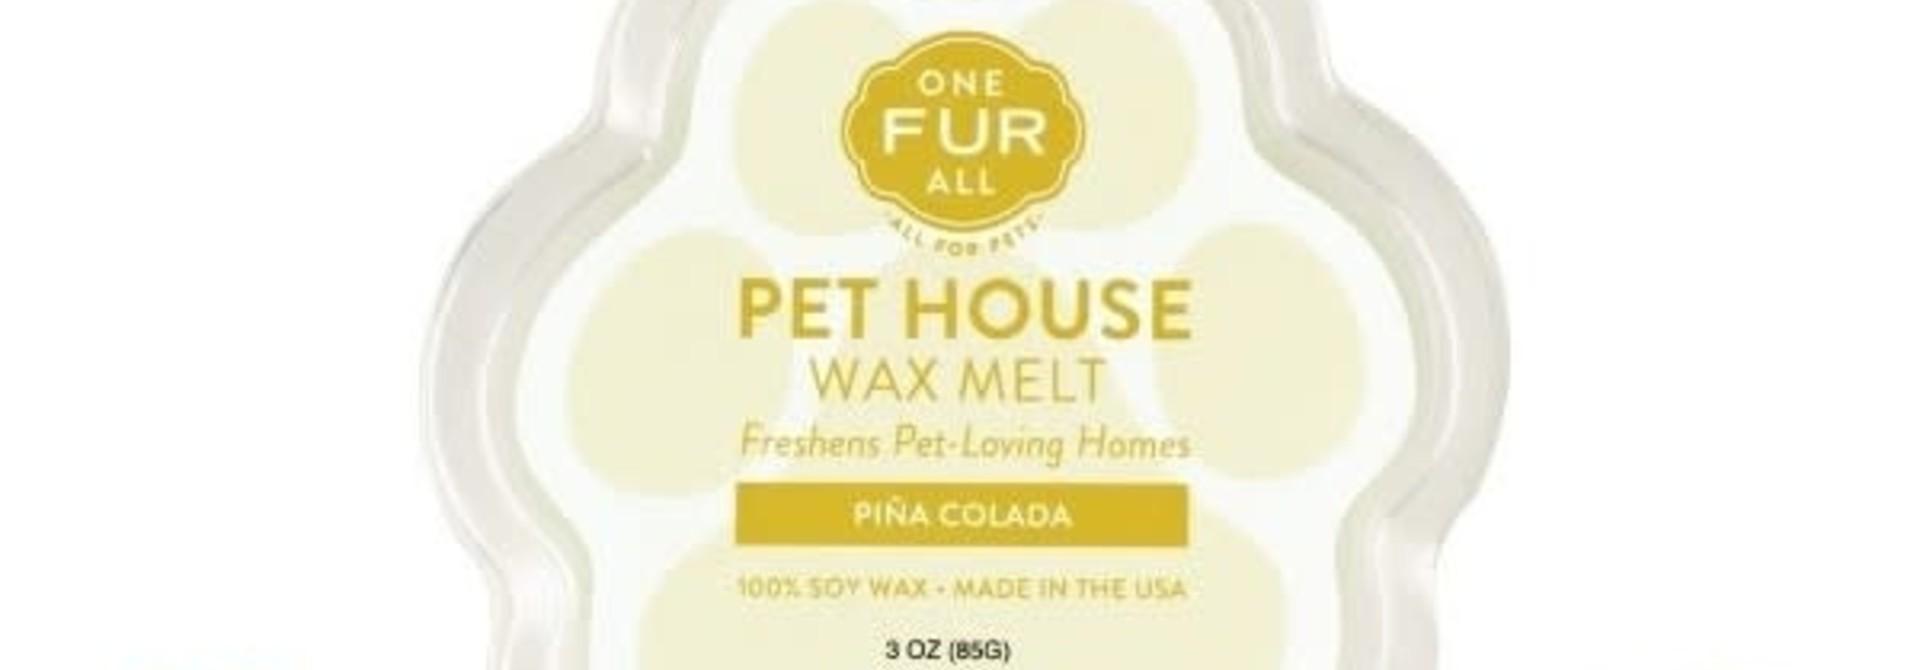 One Fur All - Wax Melts - Pina Colada